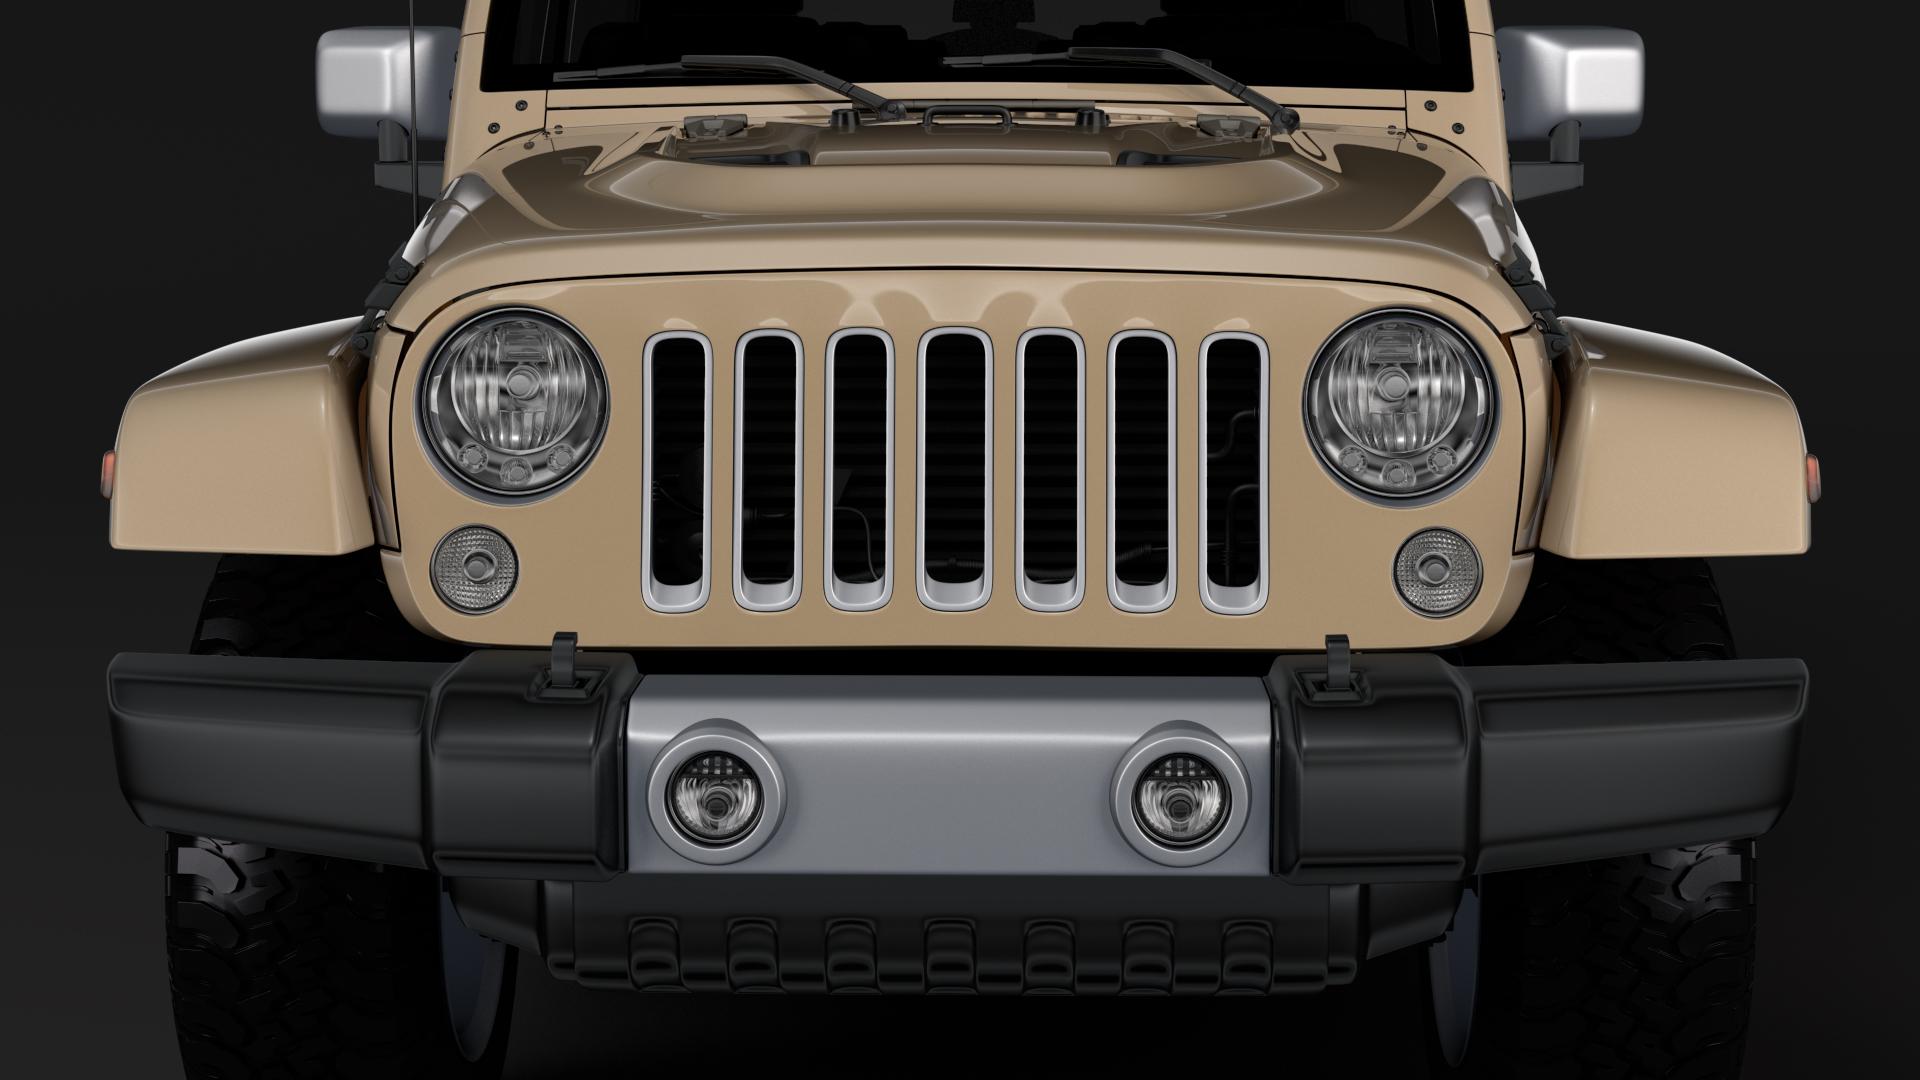 jeep wrangler chief jk 2017 3d model max fbx c4d lwo ma mb hrc xsi obj 276875